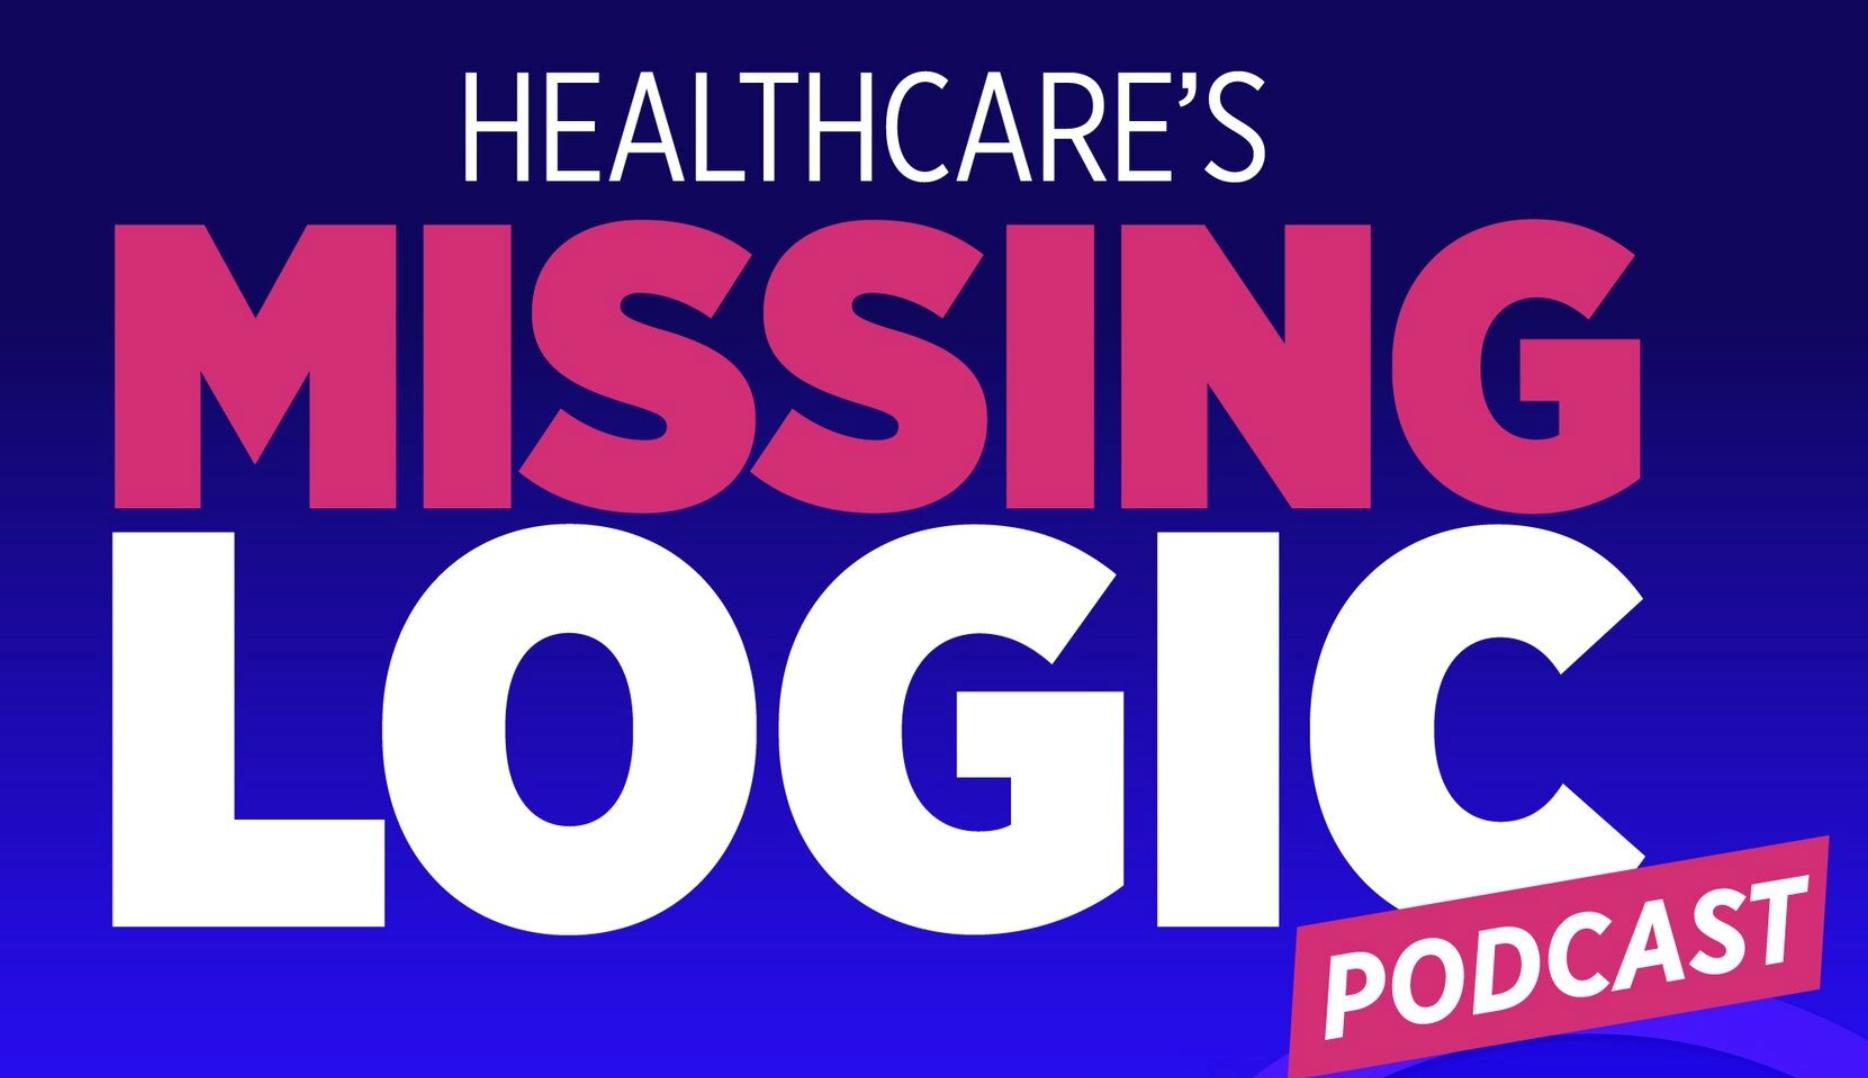 Missing Logic Podcast